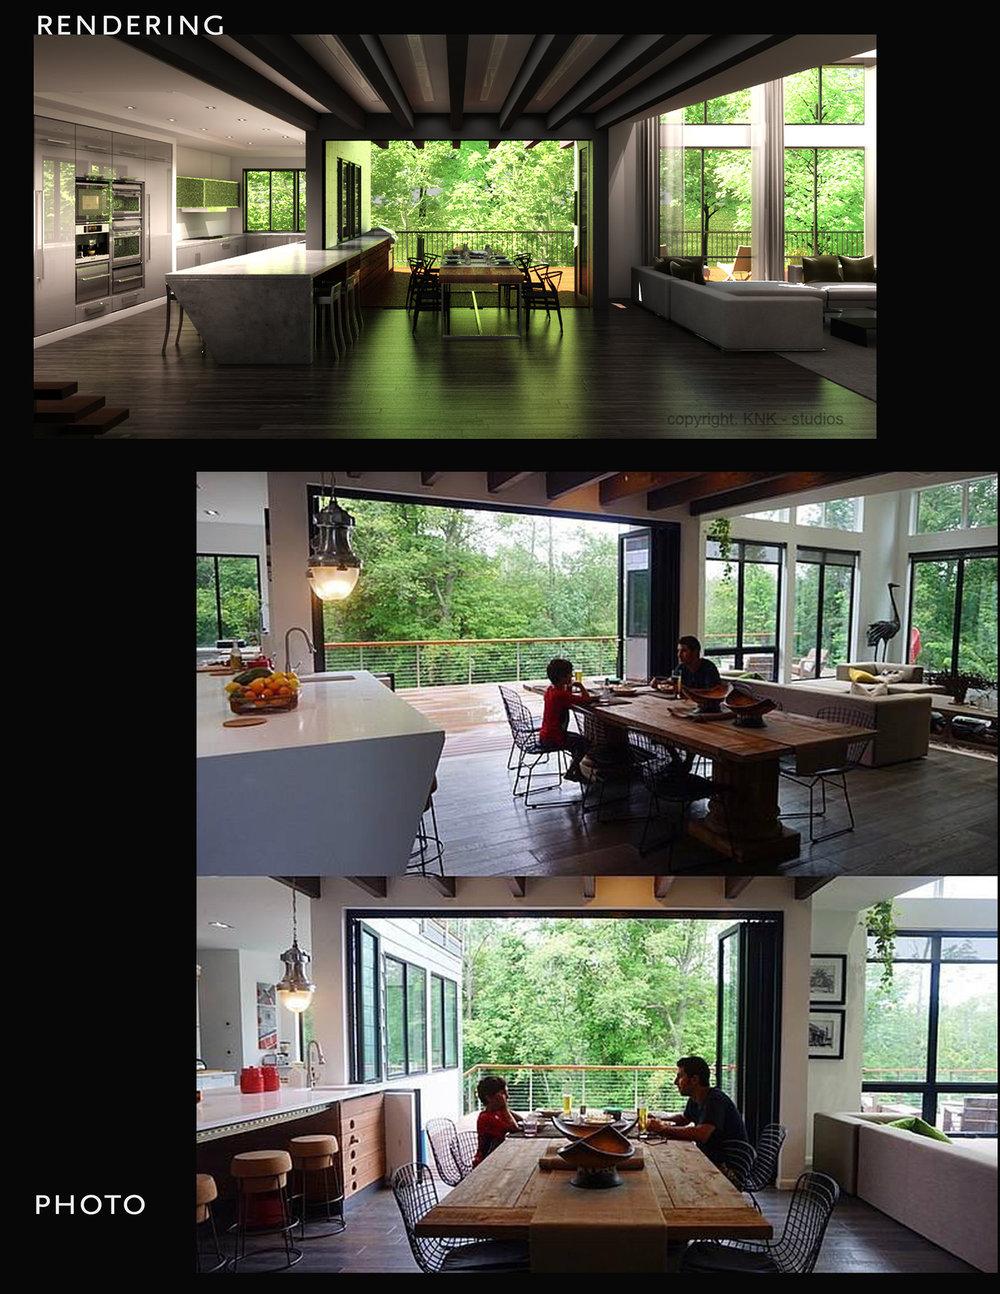 Interior_examples5.jpg